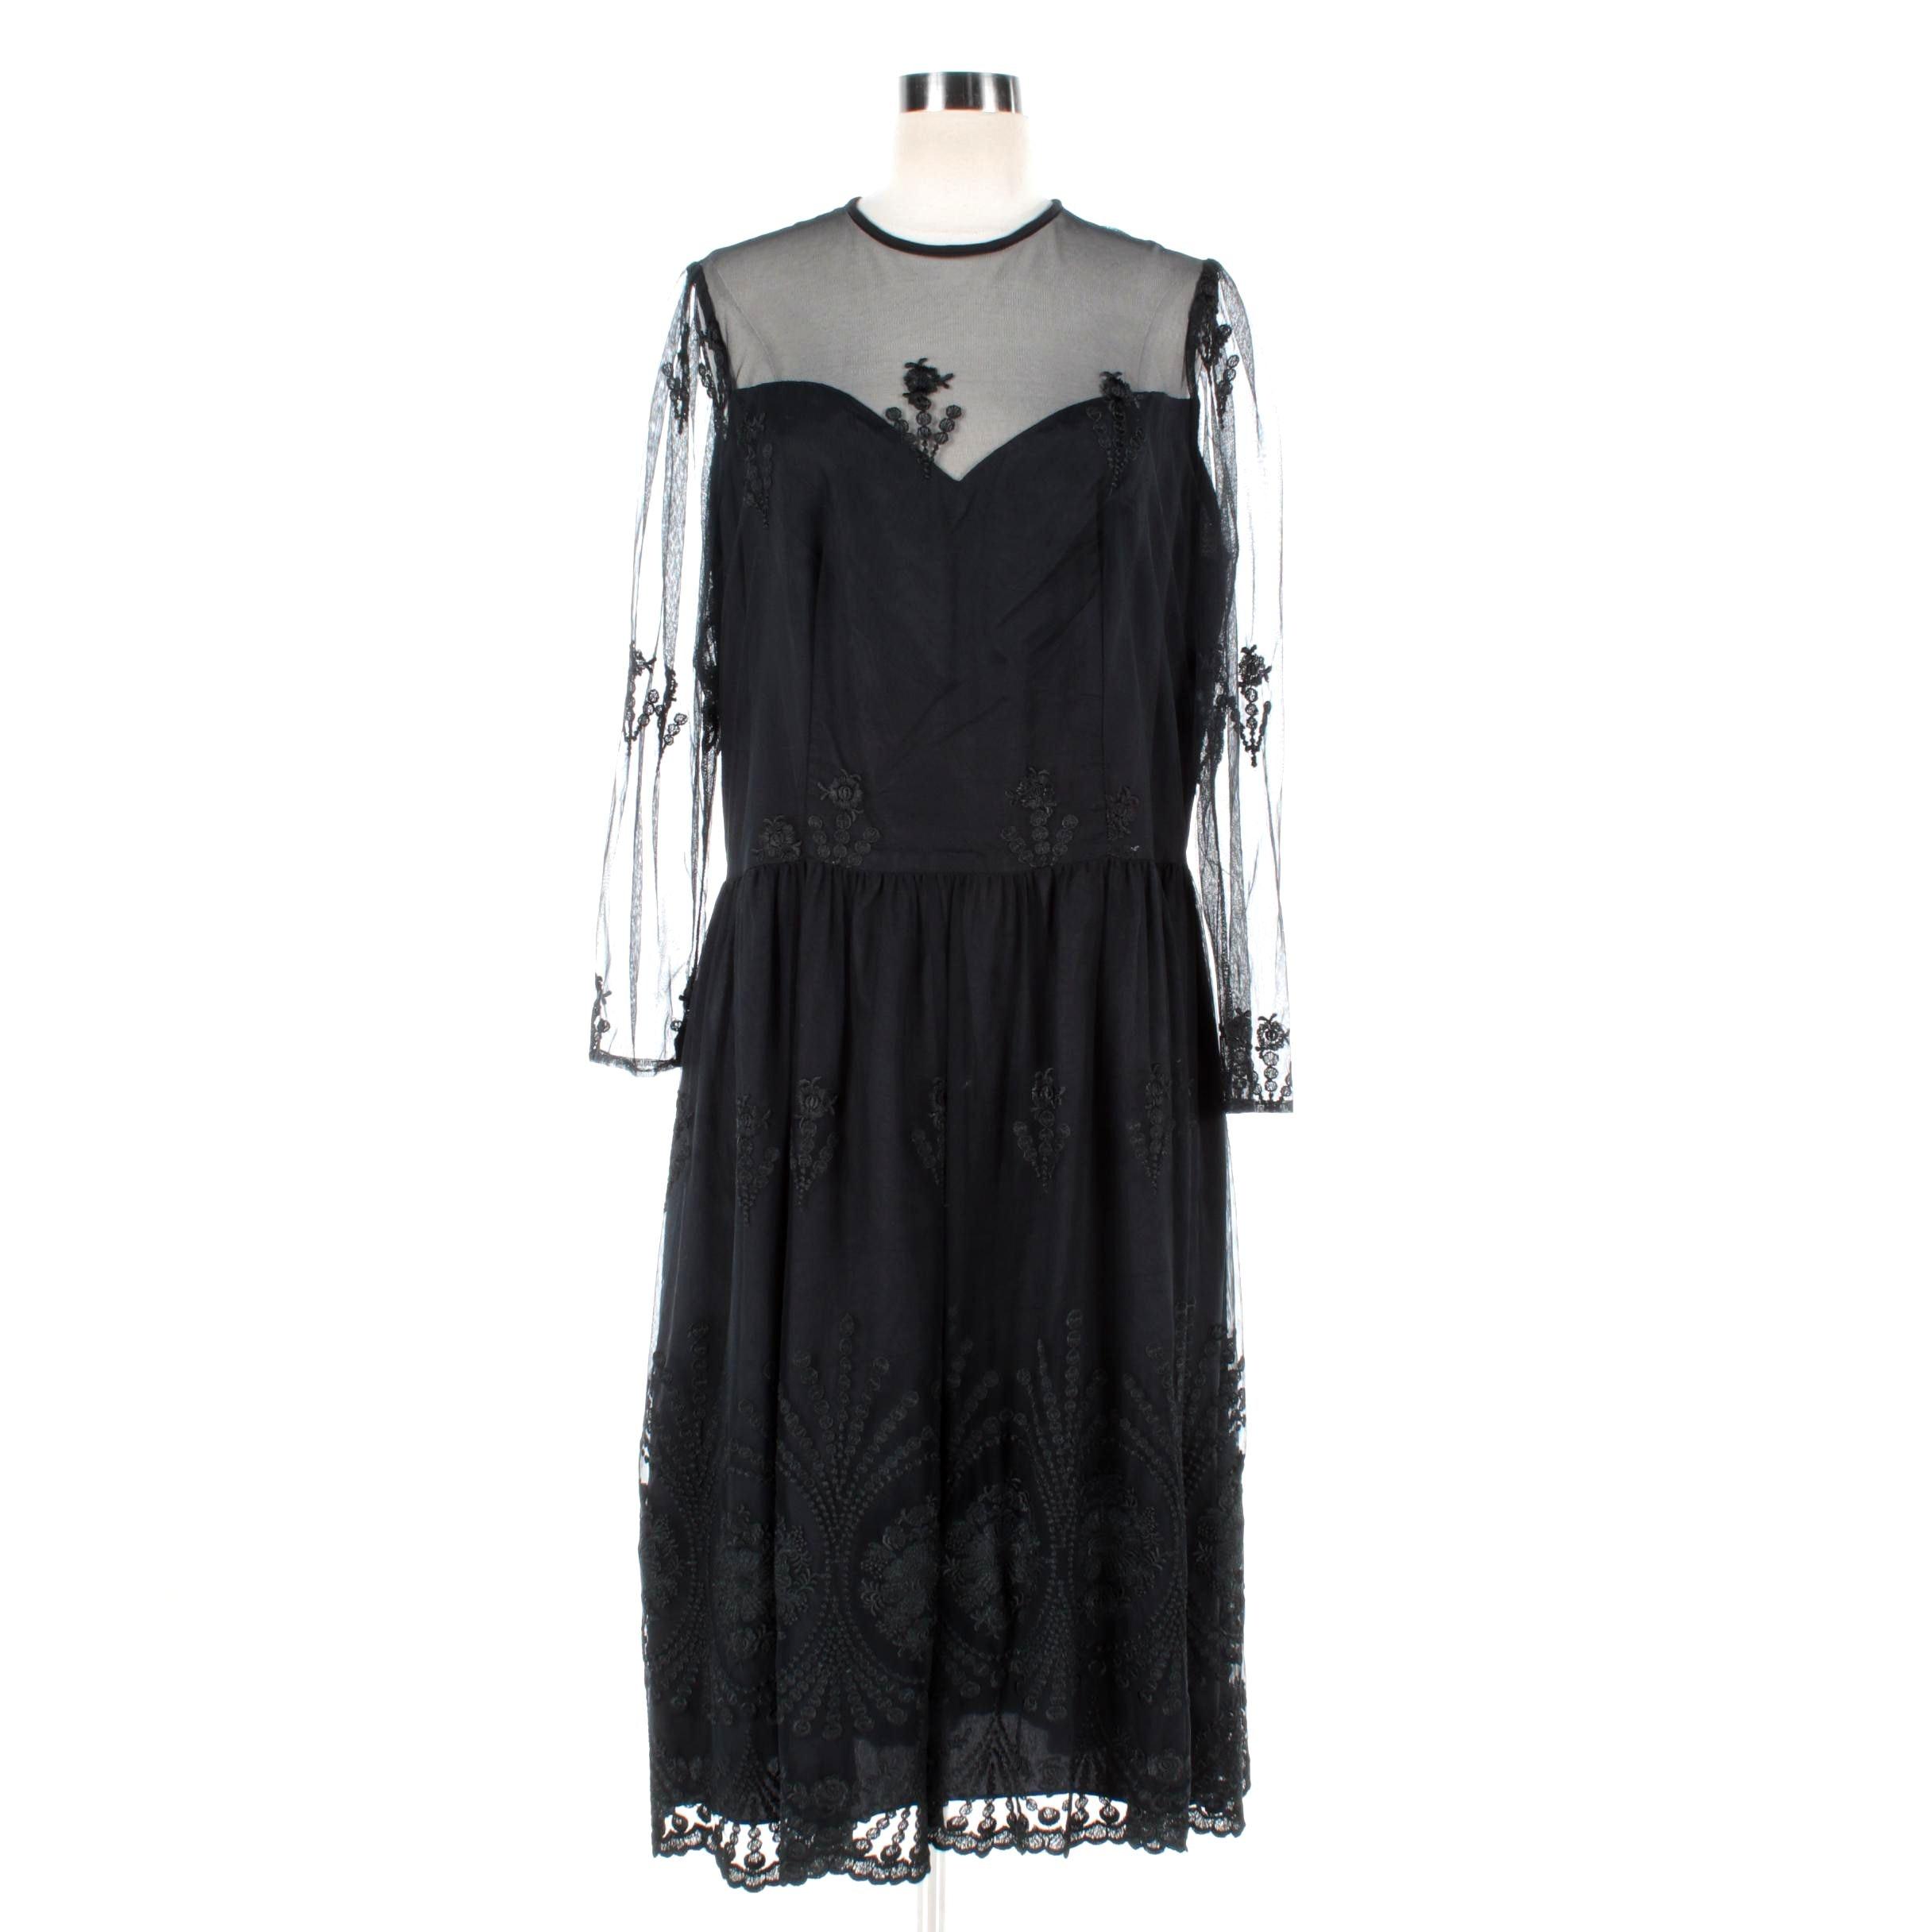 Women's Vintage Black Floral Lace Overlay Dress